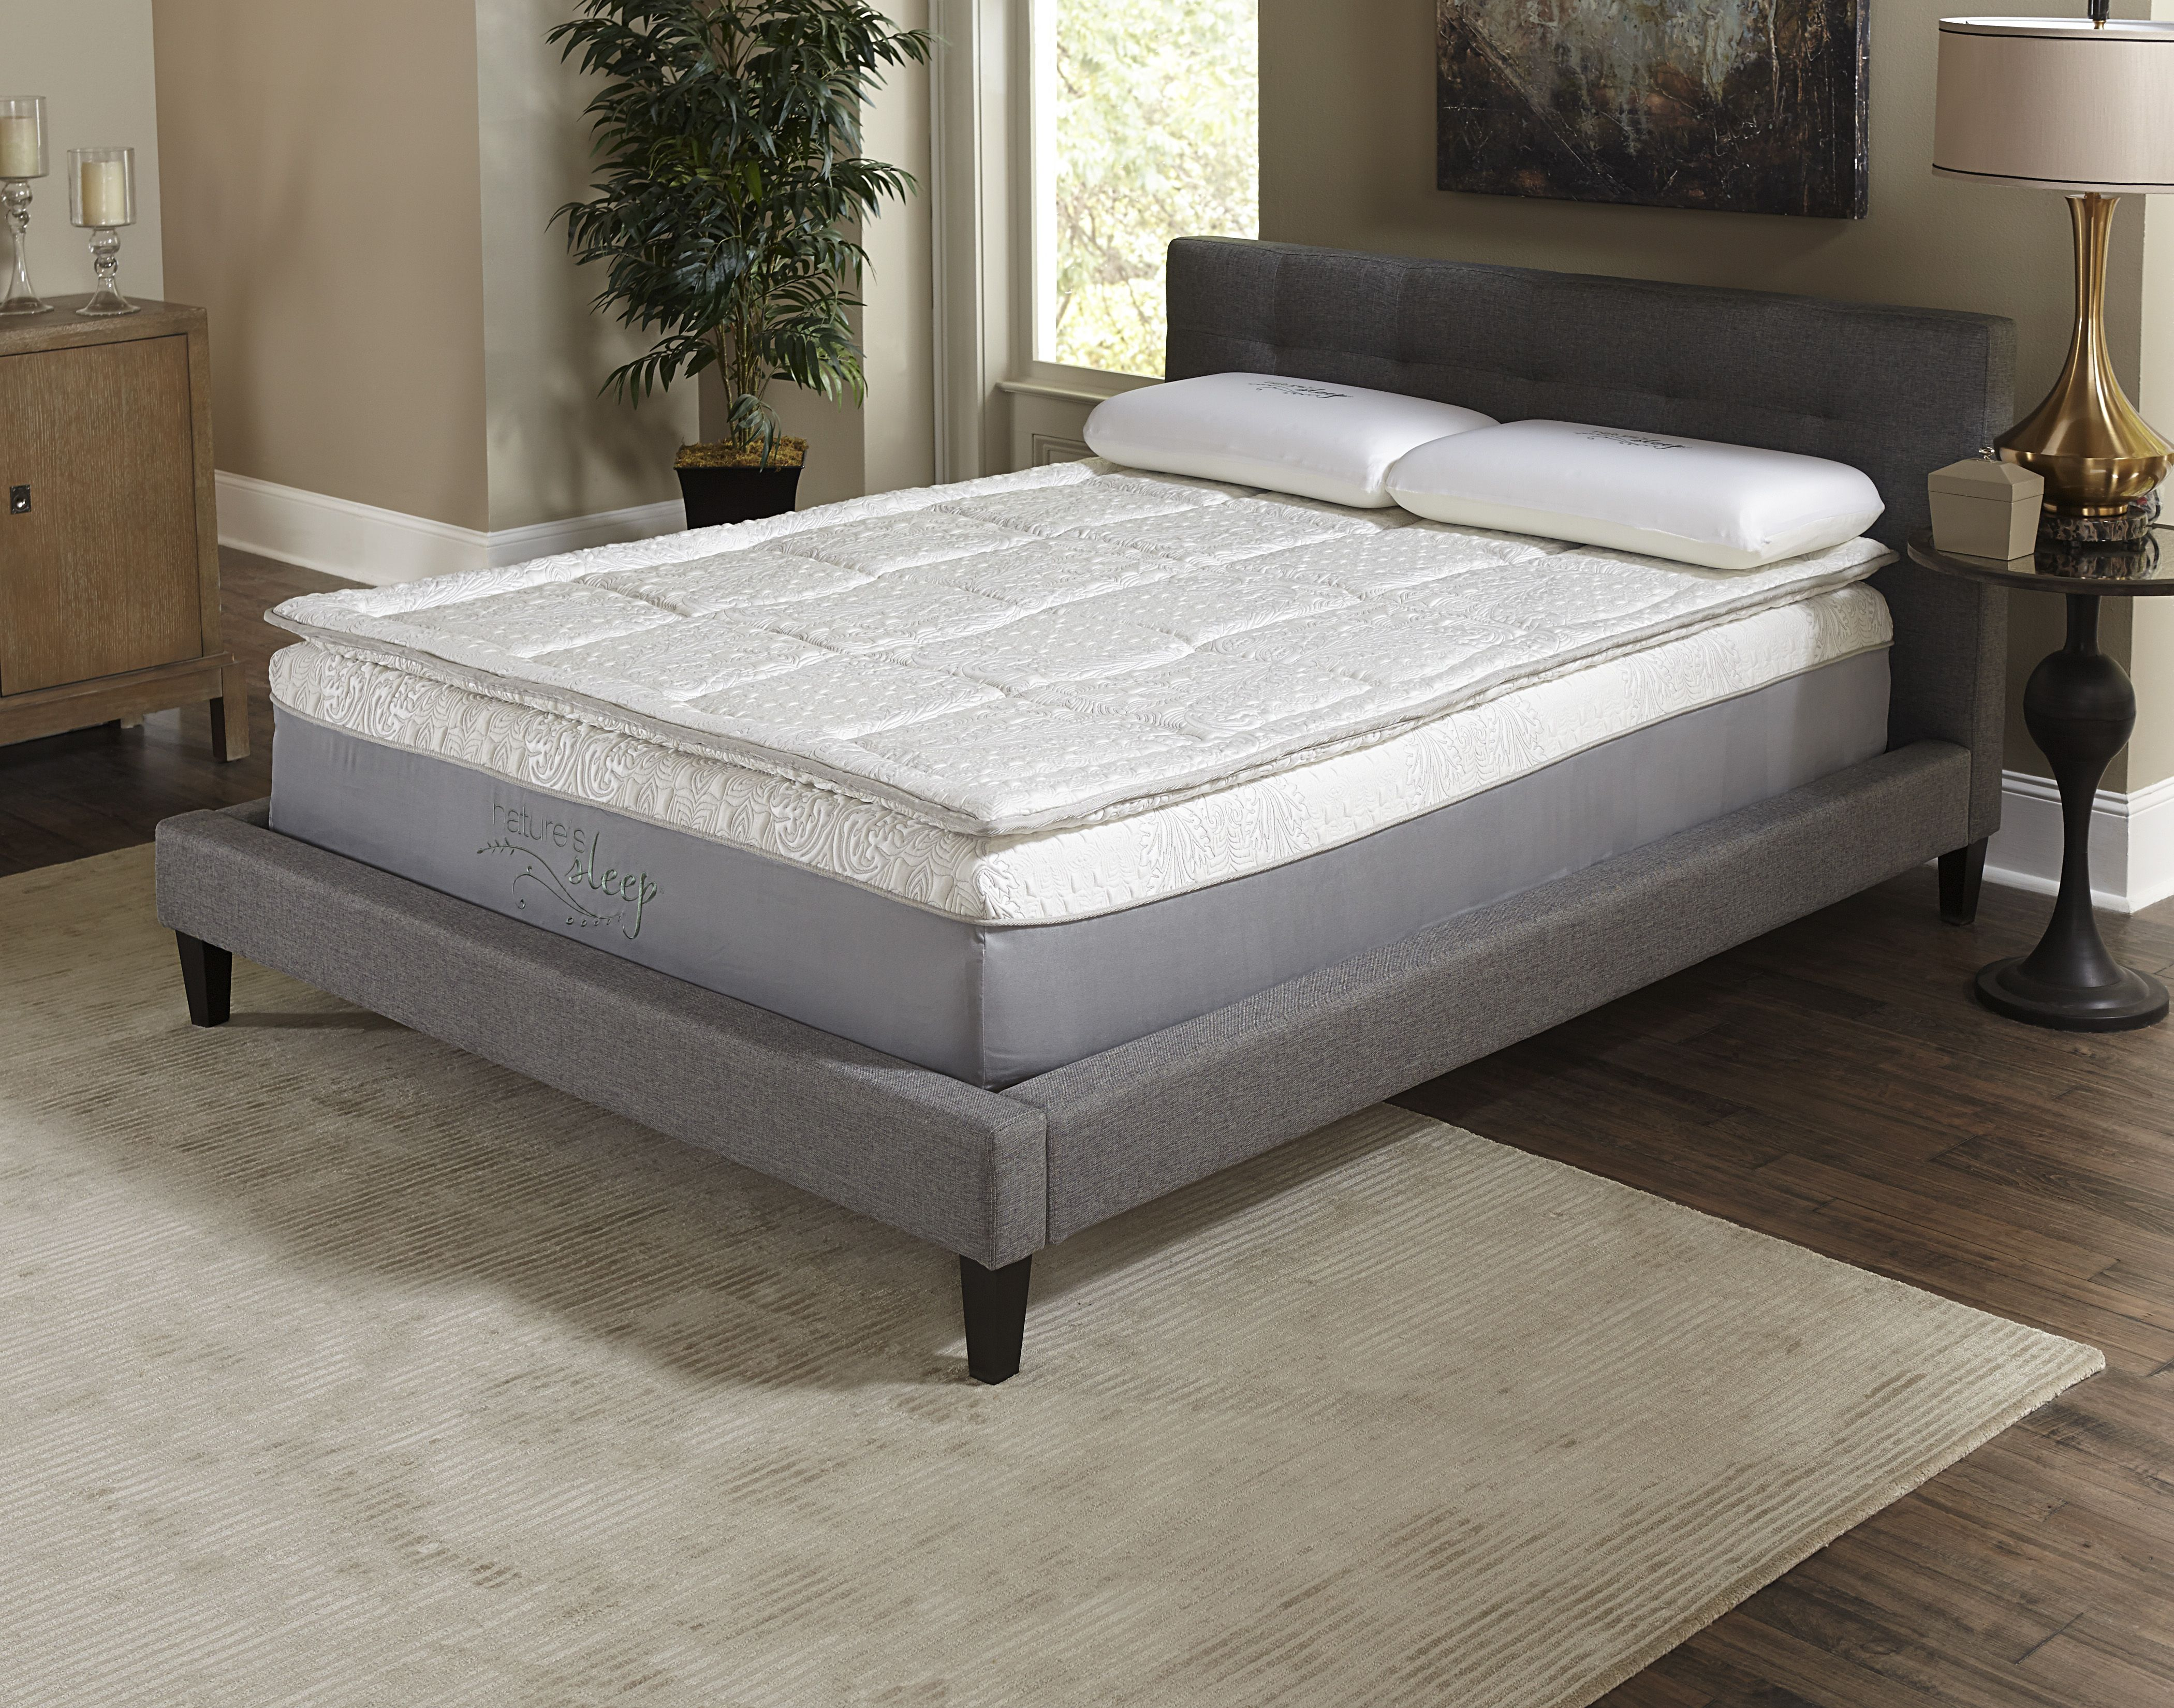 12inch Gel Infused Pillow Top Memory Foam Mattress